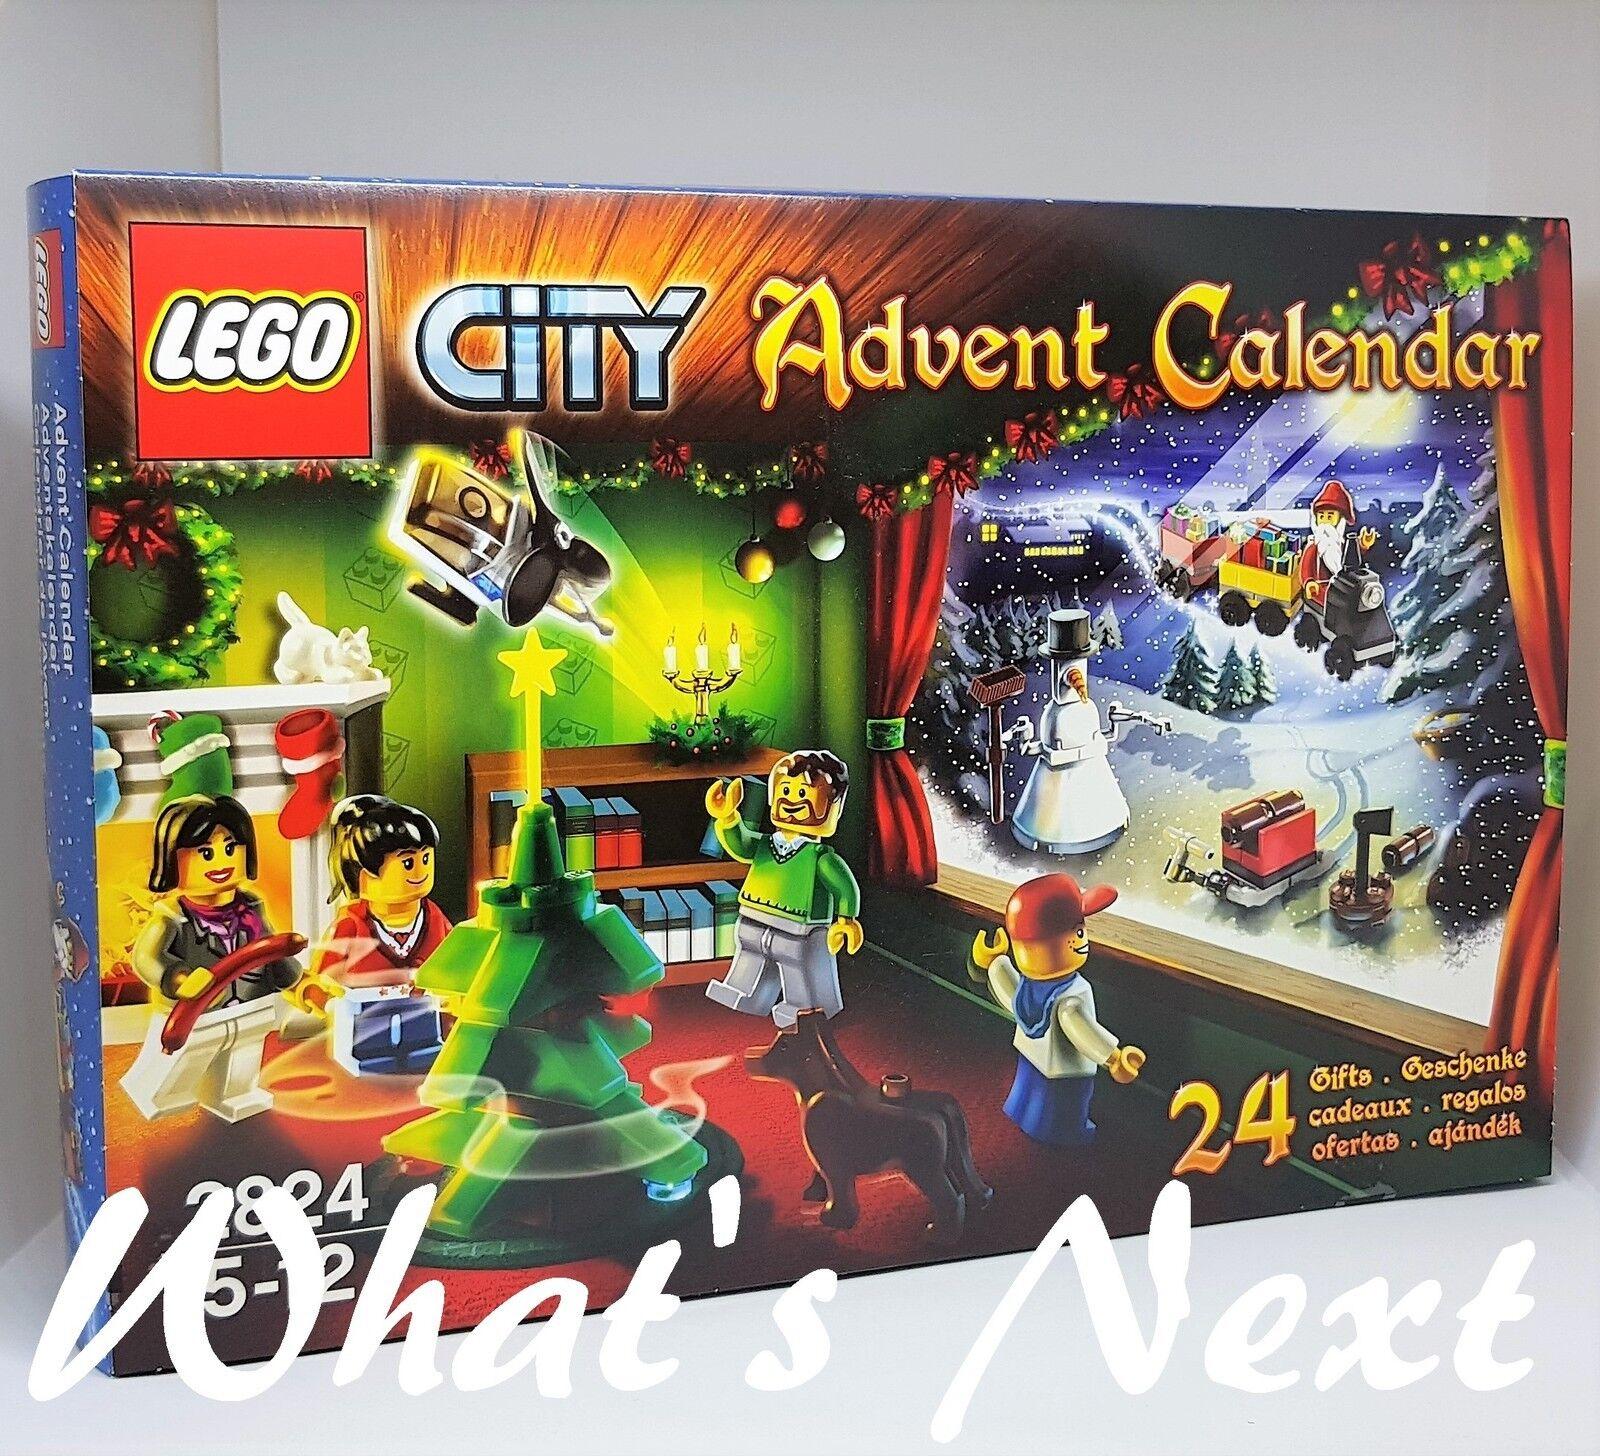 LEGO City 2010 Advent Calendar  2824  NEW  EAN 5702014602434, Item: 4560742